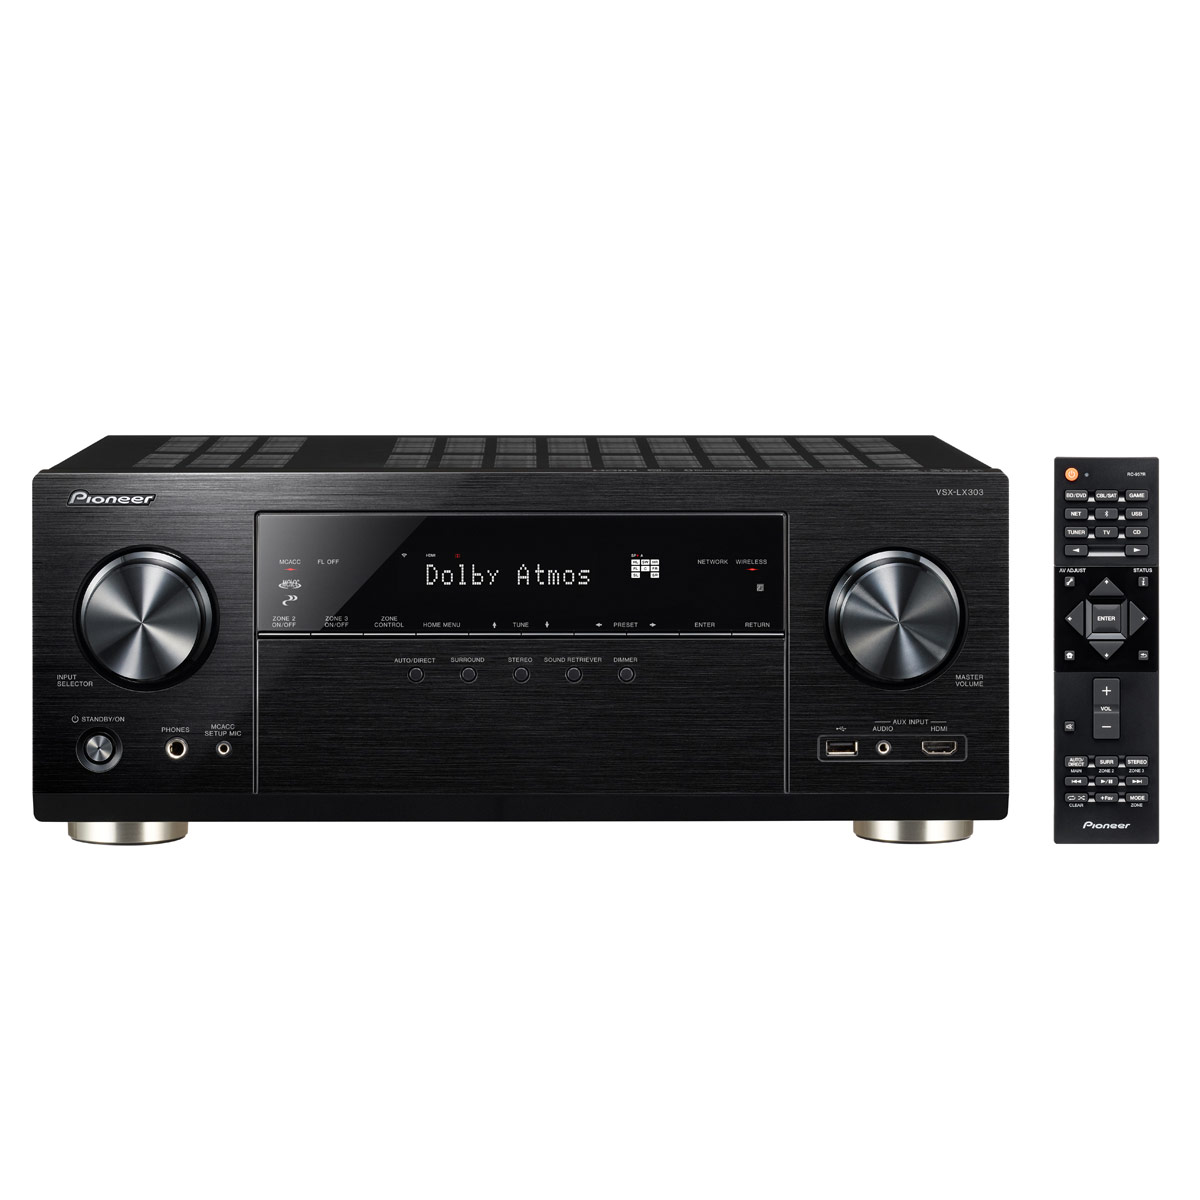 Ampli home cinéma Pioneer VSX-LX303 Noir Ampli-tuner Home Cinéma 9.2 170 Watts Multiroom, Dolby Atmos, DTS:X, HDMI 4K UHD, HDCP 2.2, HDR, Hi-Res Audio, Wi-Fi Dual Band, Bluetooth, Chromecast, DTS Play-Fi, AirPlay